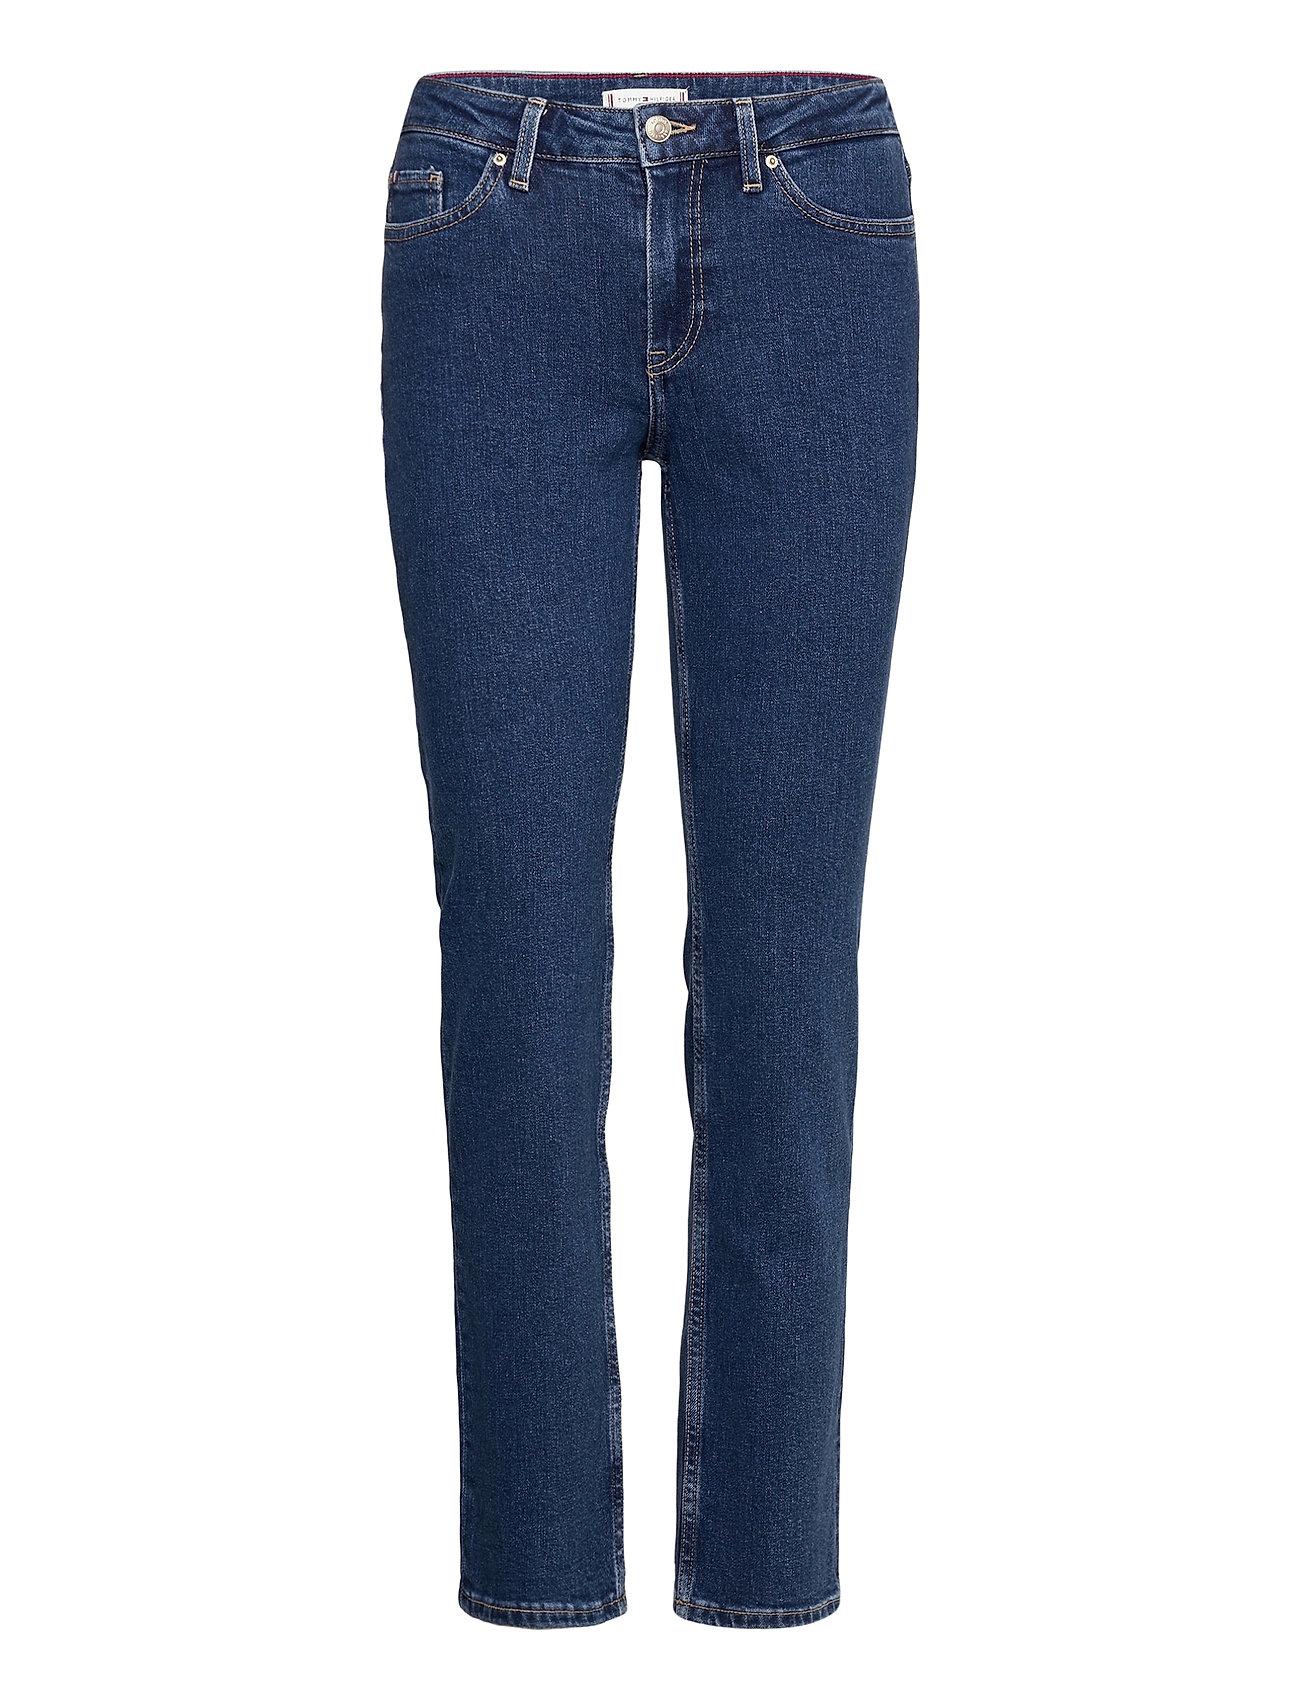 Rome Straight Rw Chris Slim Jeans Blå Tommy Hilfiger